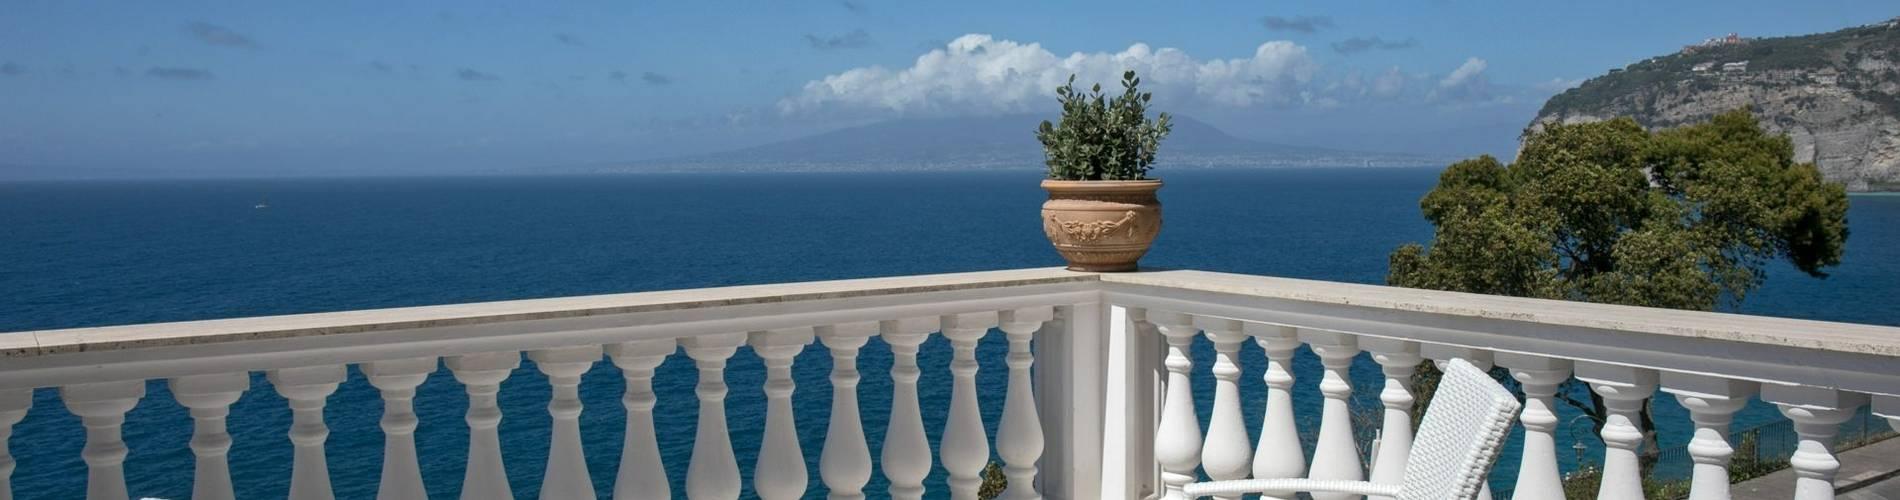 Villa Garden, Amalfi, Italy (3).jpg